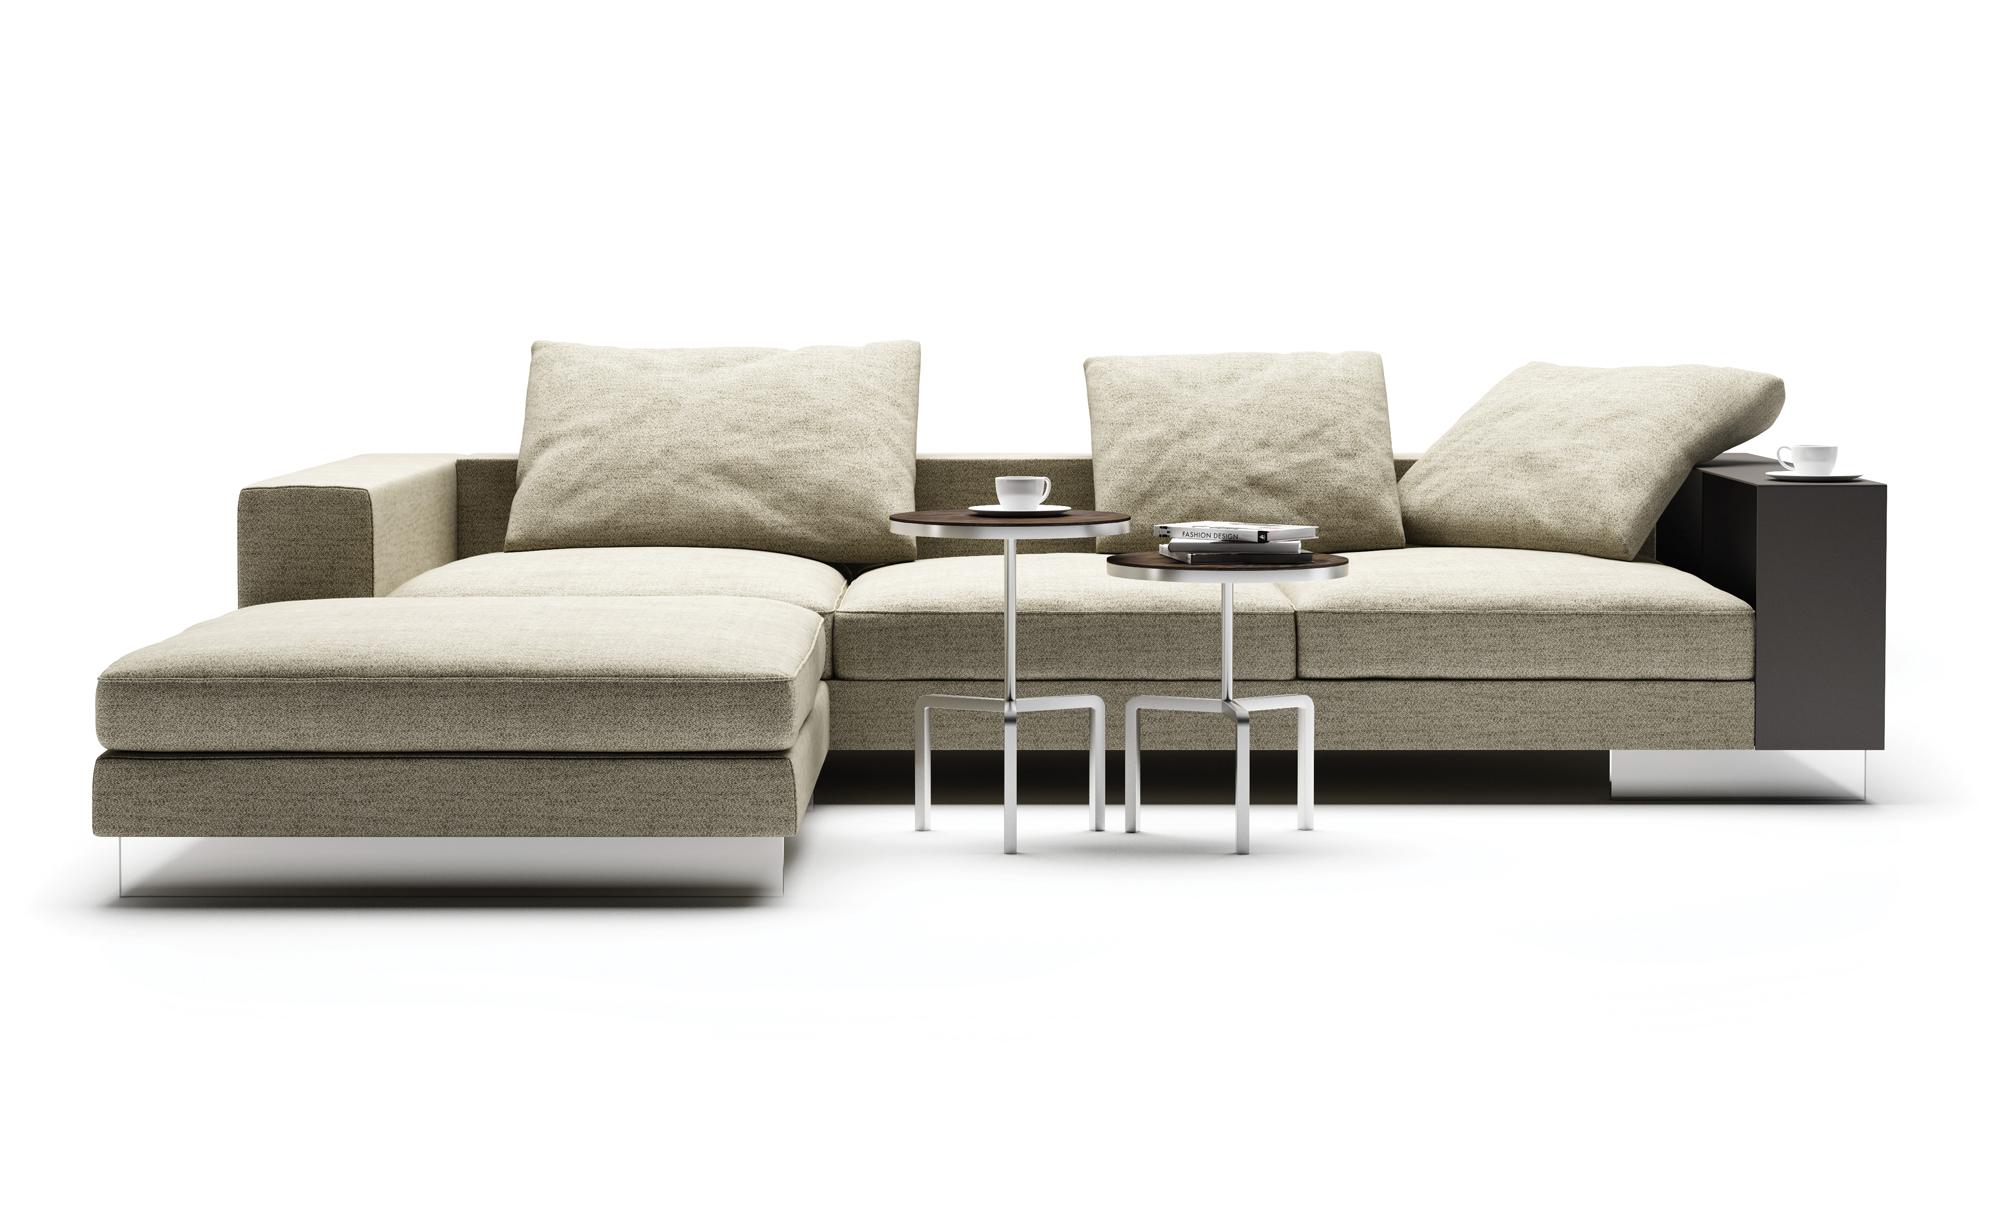 Lightpiece modular sofa Fanuli Furniture